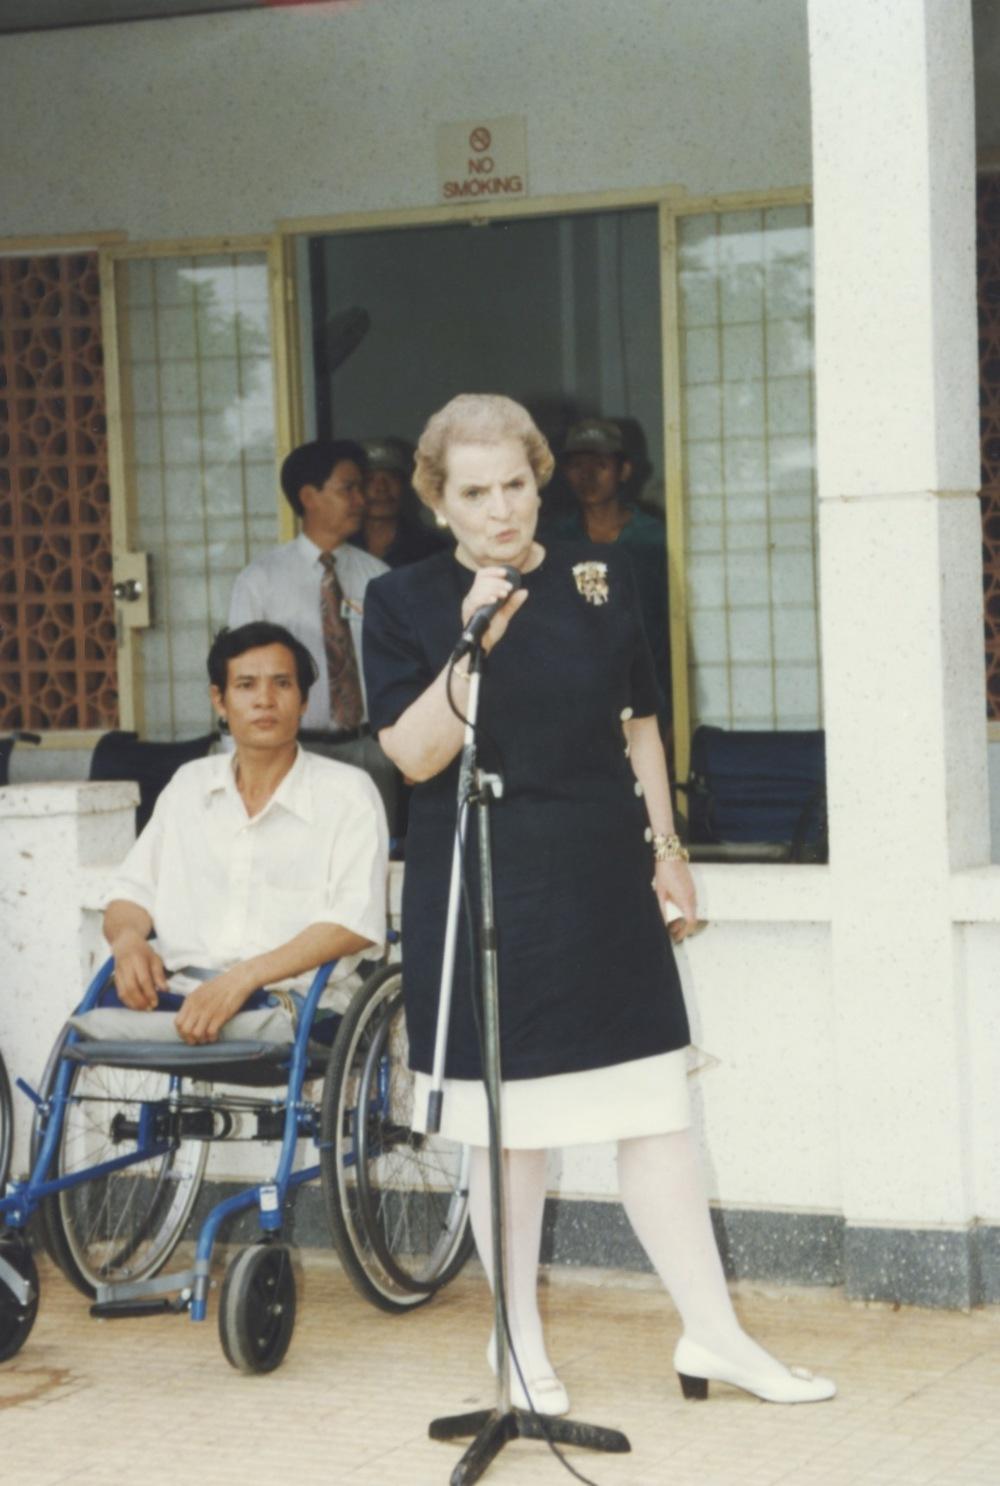 US Secretary of State Madeline Albright - 44.jpeg